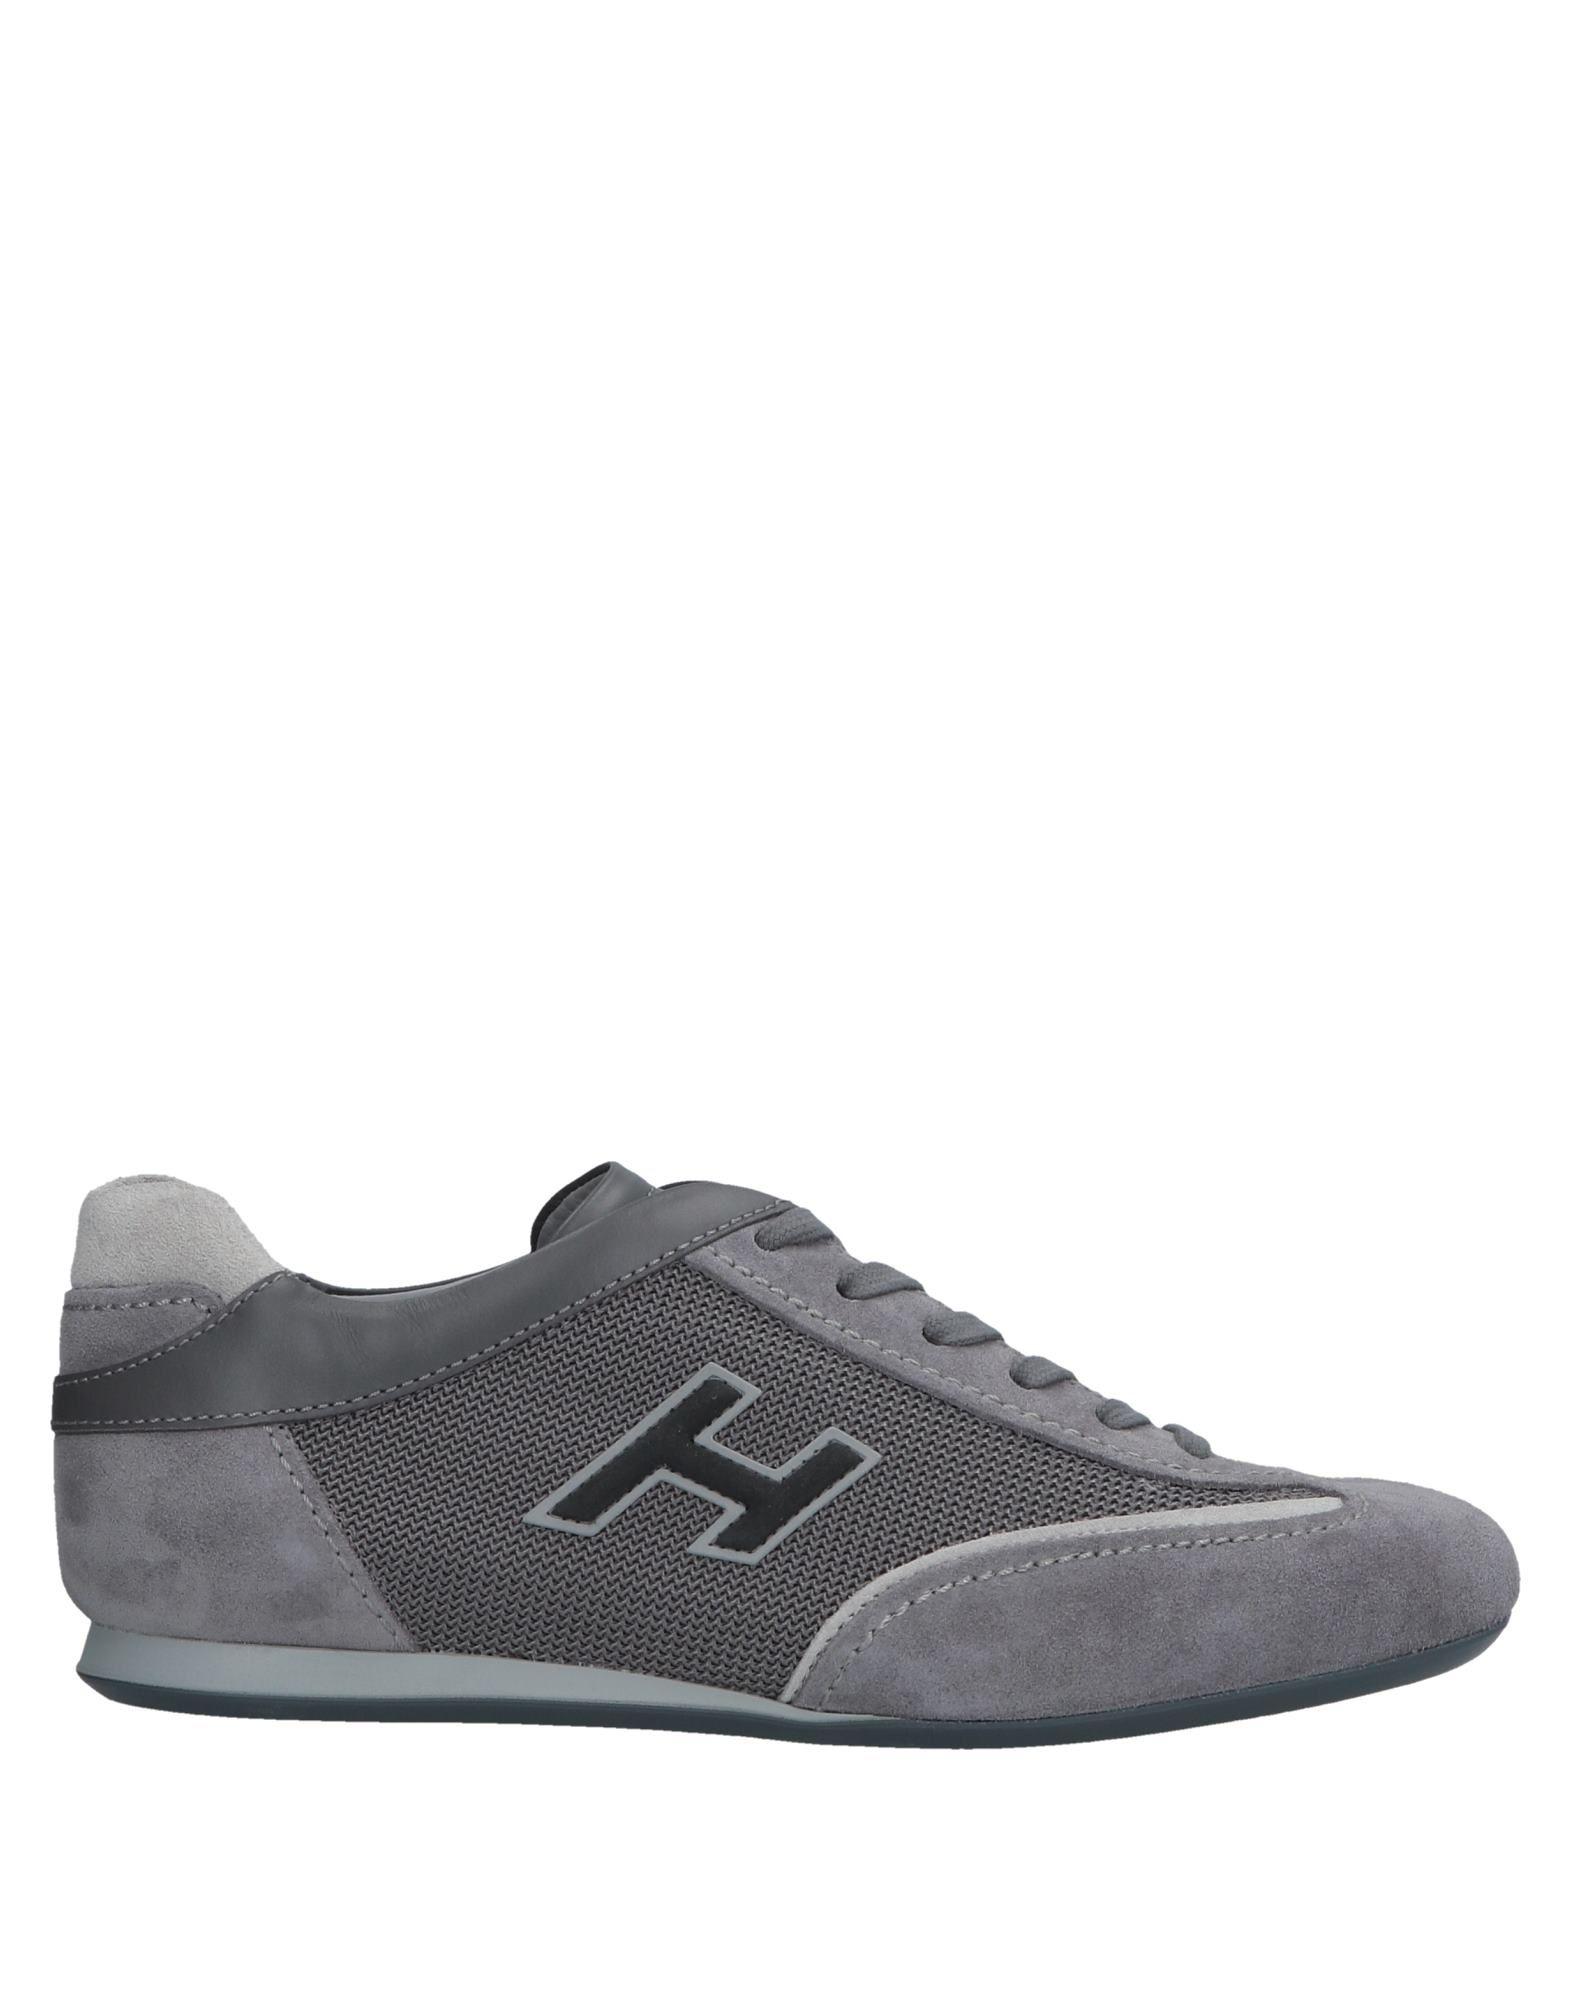 Hogan Sneakers - Men Hogan Sneakers online on 11577774TI  United Kingdom - 11577774TI on 3226e3